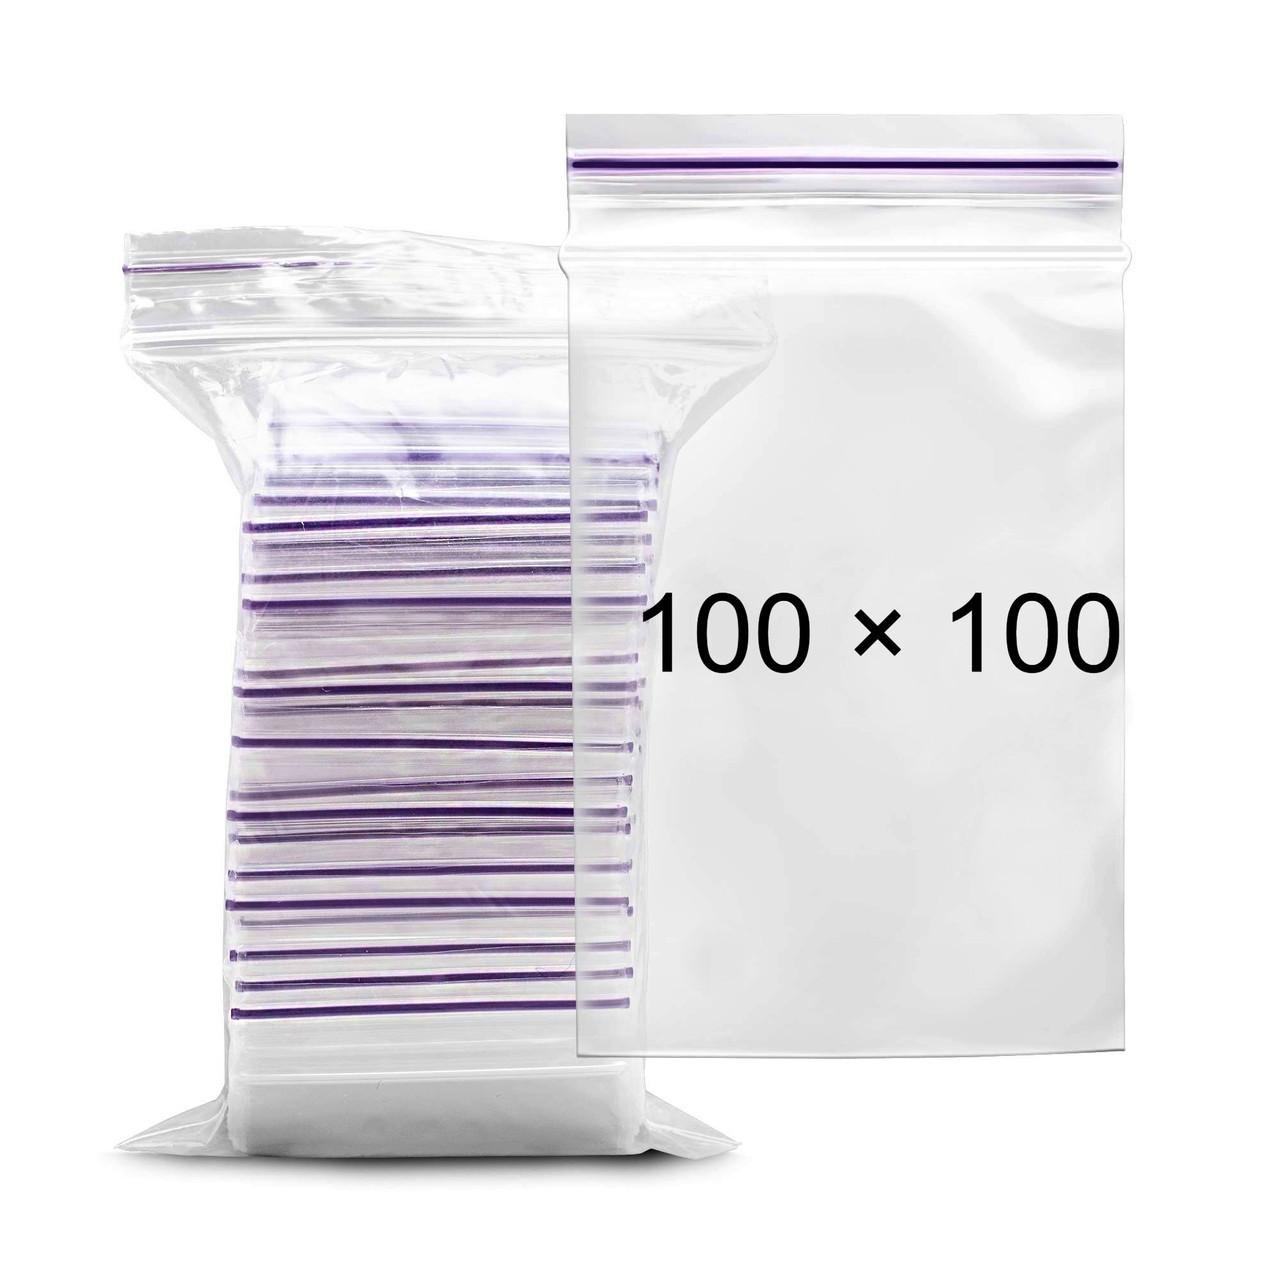 Пакеты с замком Zip-Lock - 100 × 100